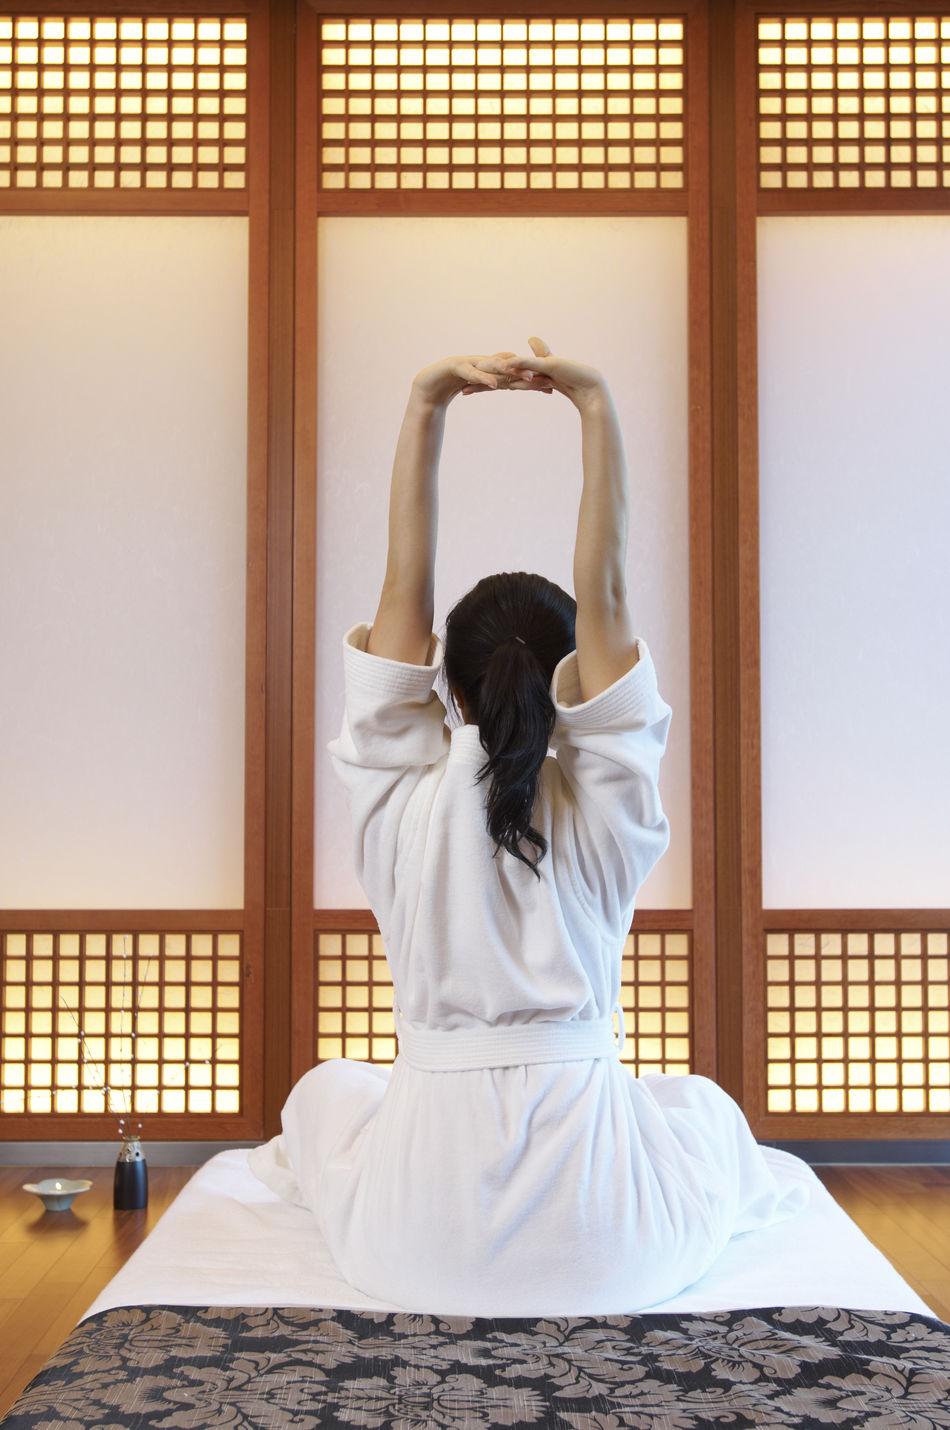 Beautiful stock photos of yoga, Arms Raised, Cross-Legged, Domestic Room, Exercising